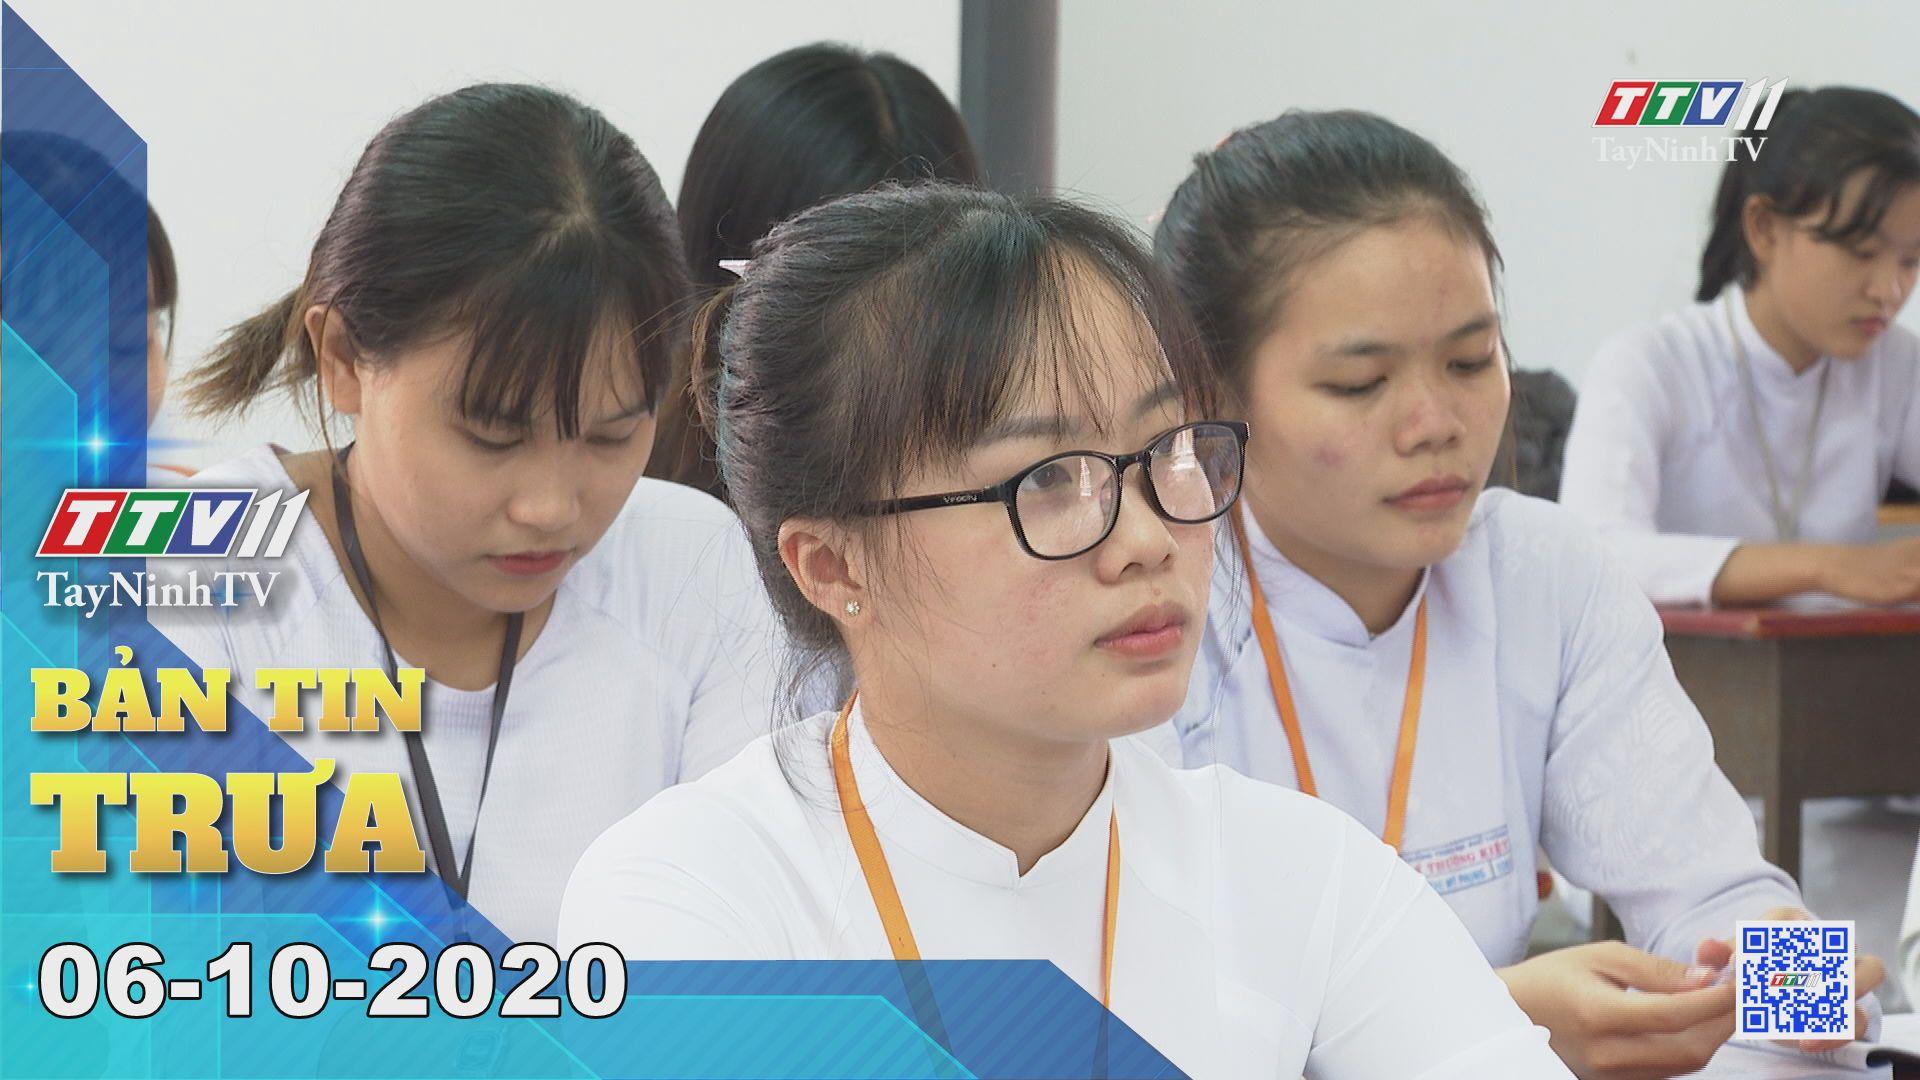 Bản tin trưa 06-10-2020 | Tin tức hôm nay | TayNinhTV